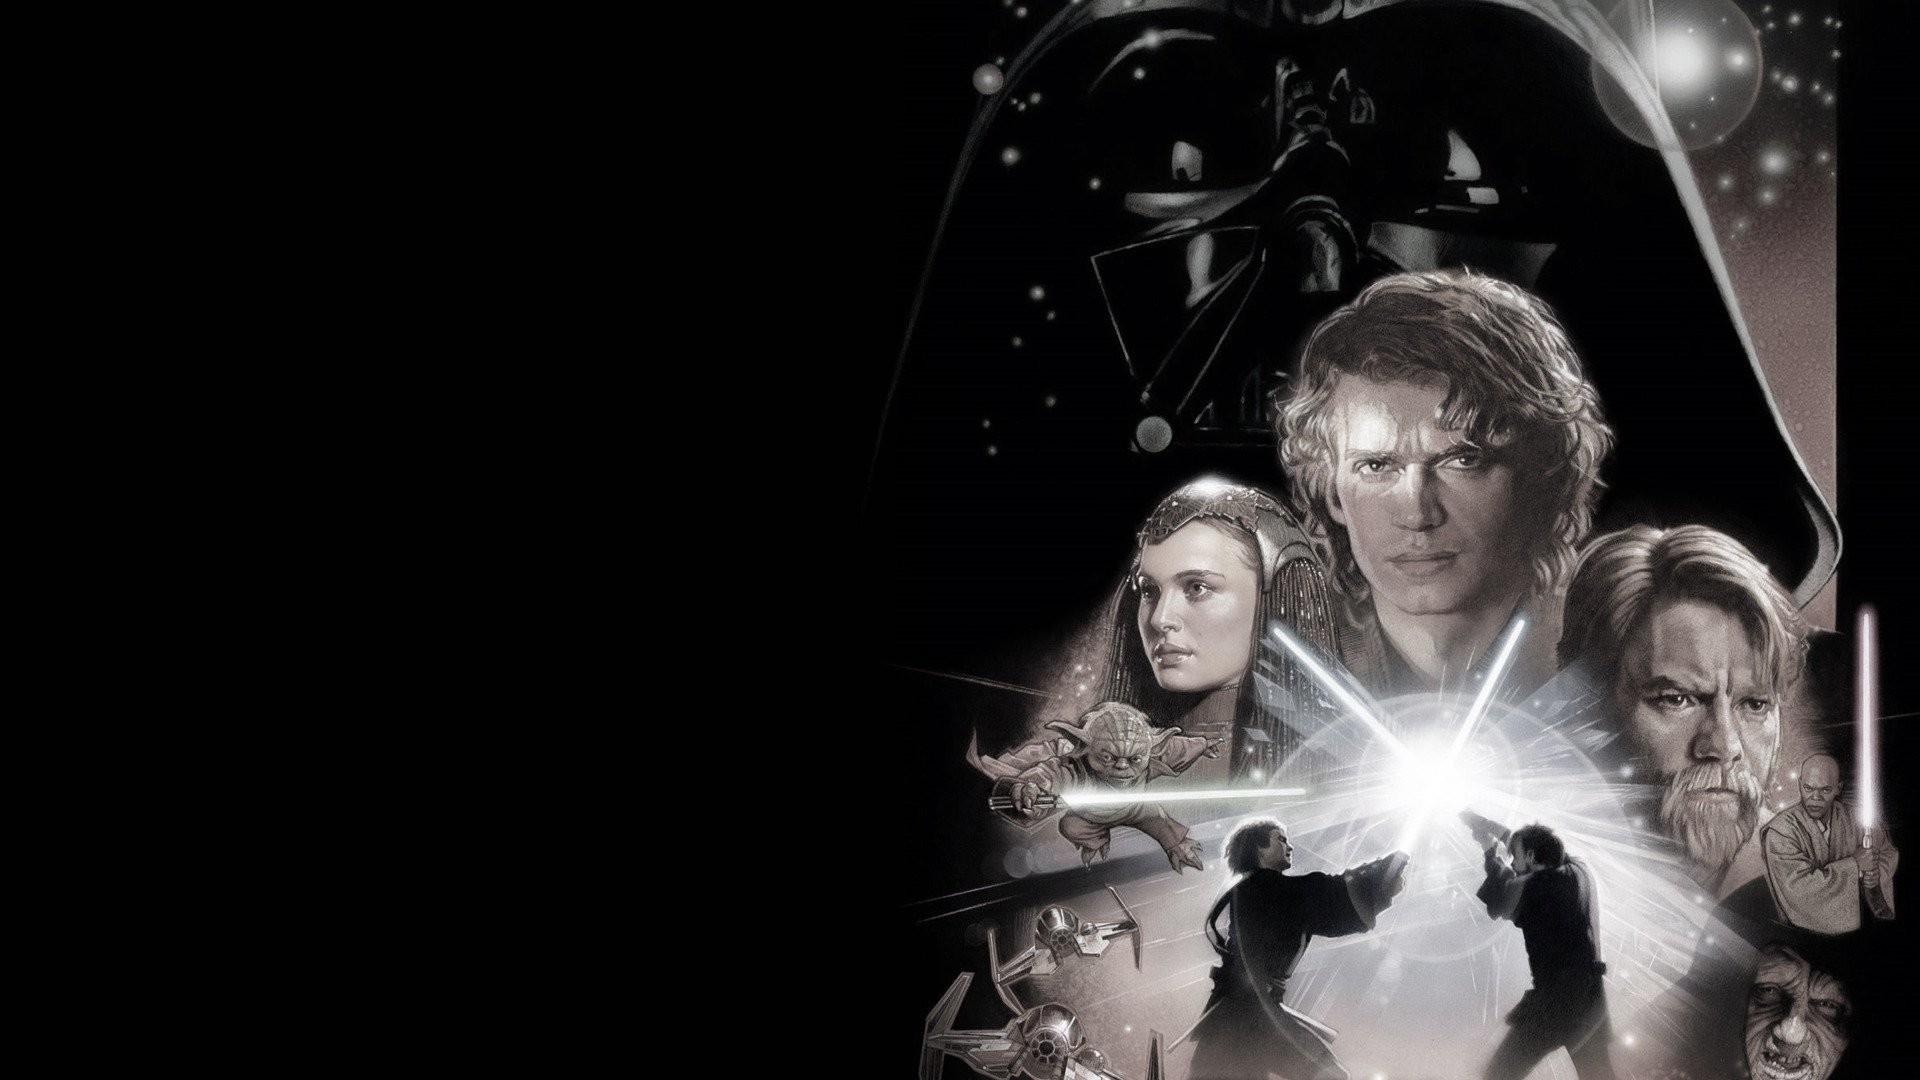 Movie РStar Wars Episode III: Revenge of the Sith Padm̩ Amidala Mace Windu  Obi